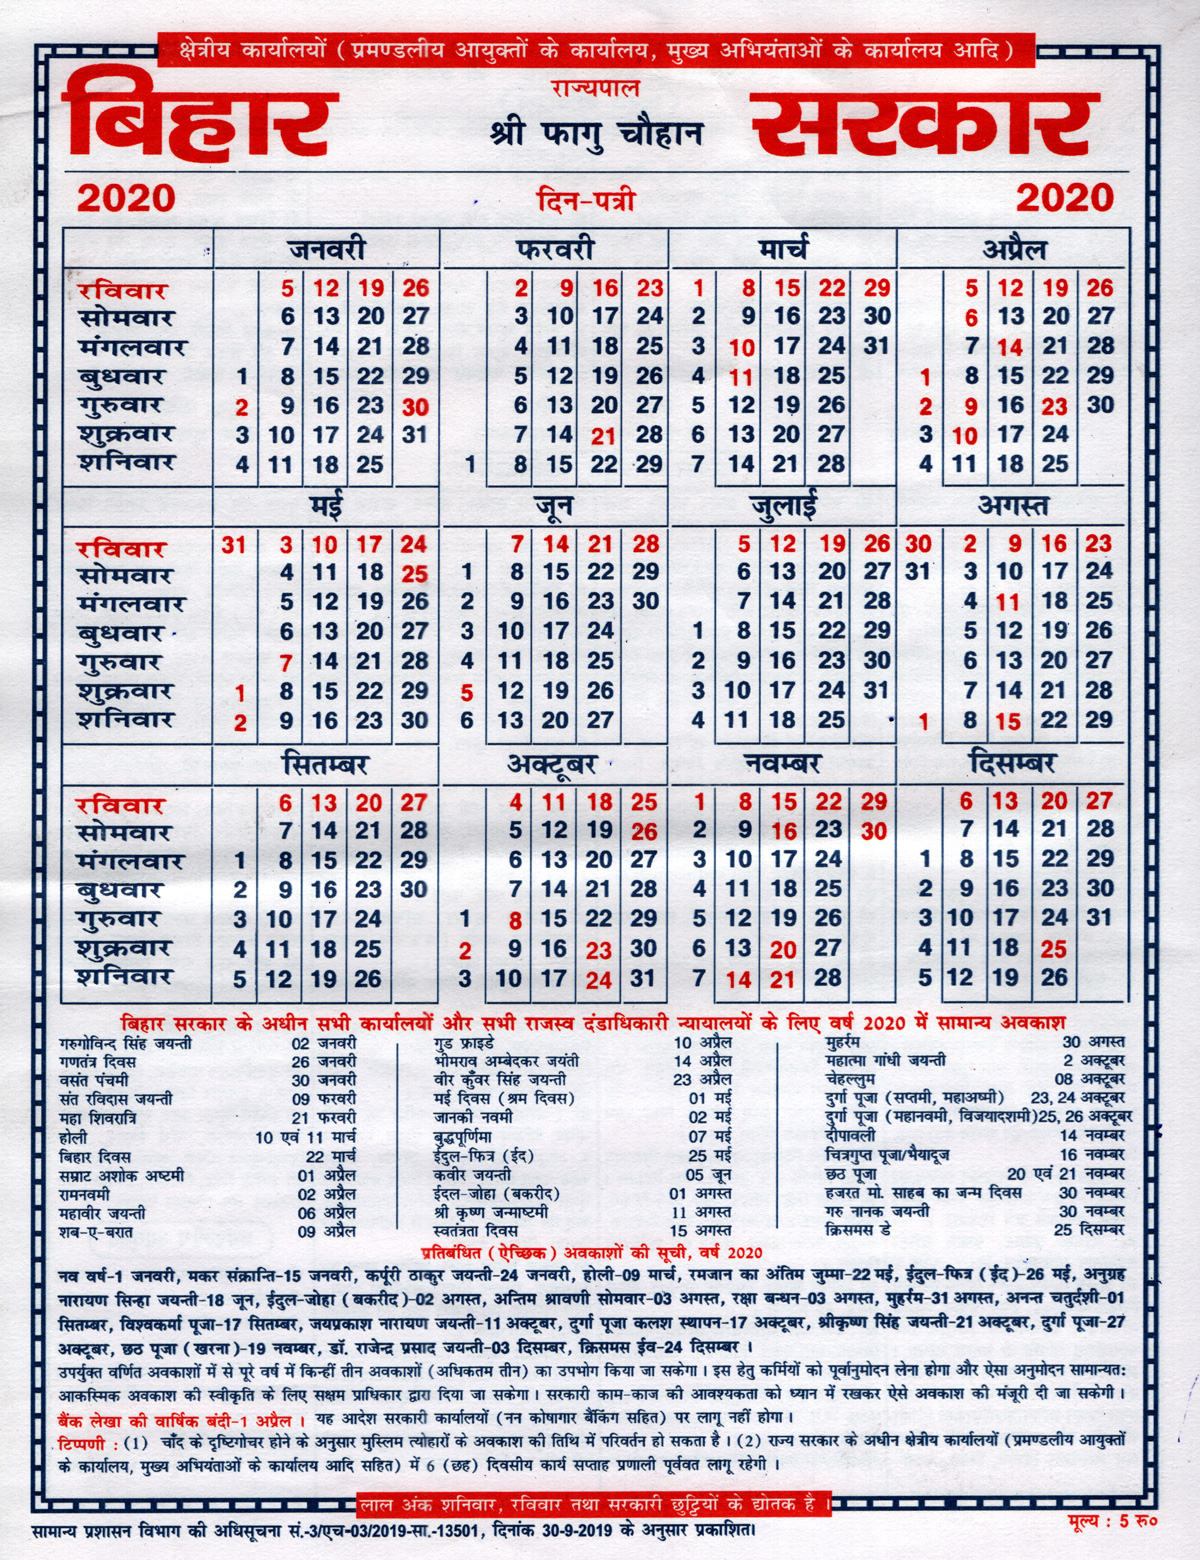 Bihar Govt. Calendar  Patna Bihar Directory within Bihar Government Calender